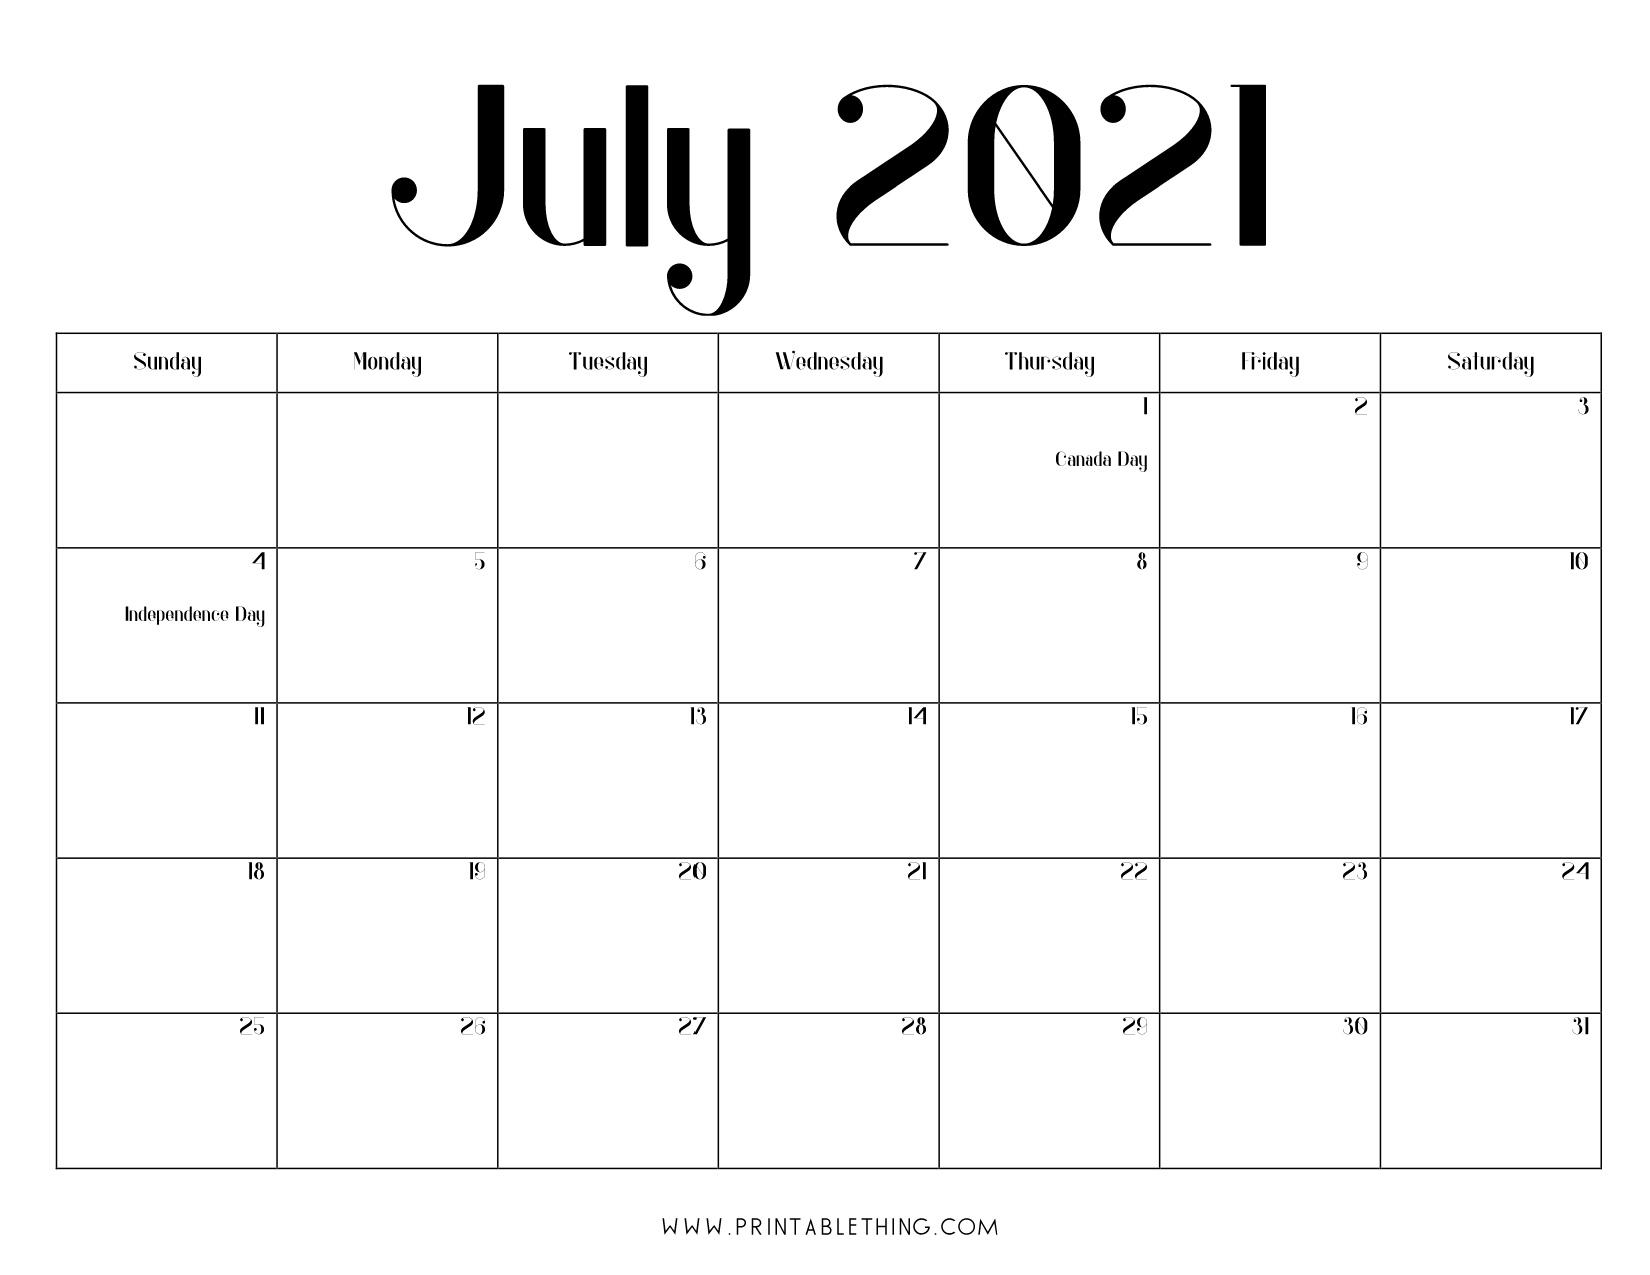 July 2021 Calendar Pdf, July 2021 Calendar Image, Print Pdf & Image Calendar For The Month Of July 2021